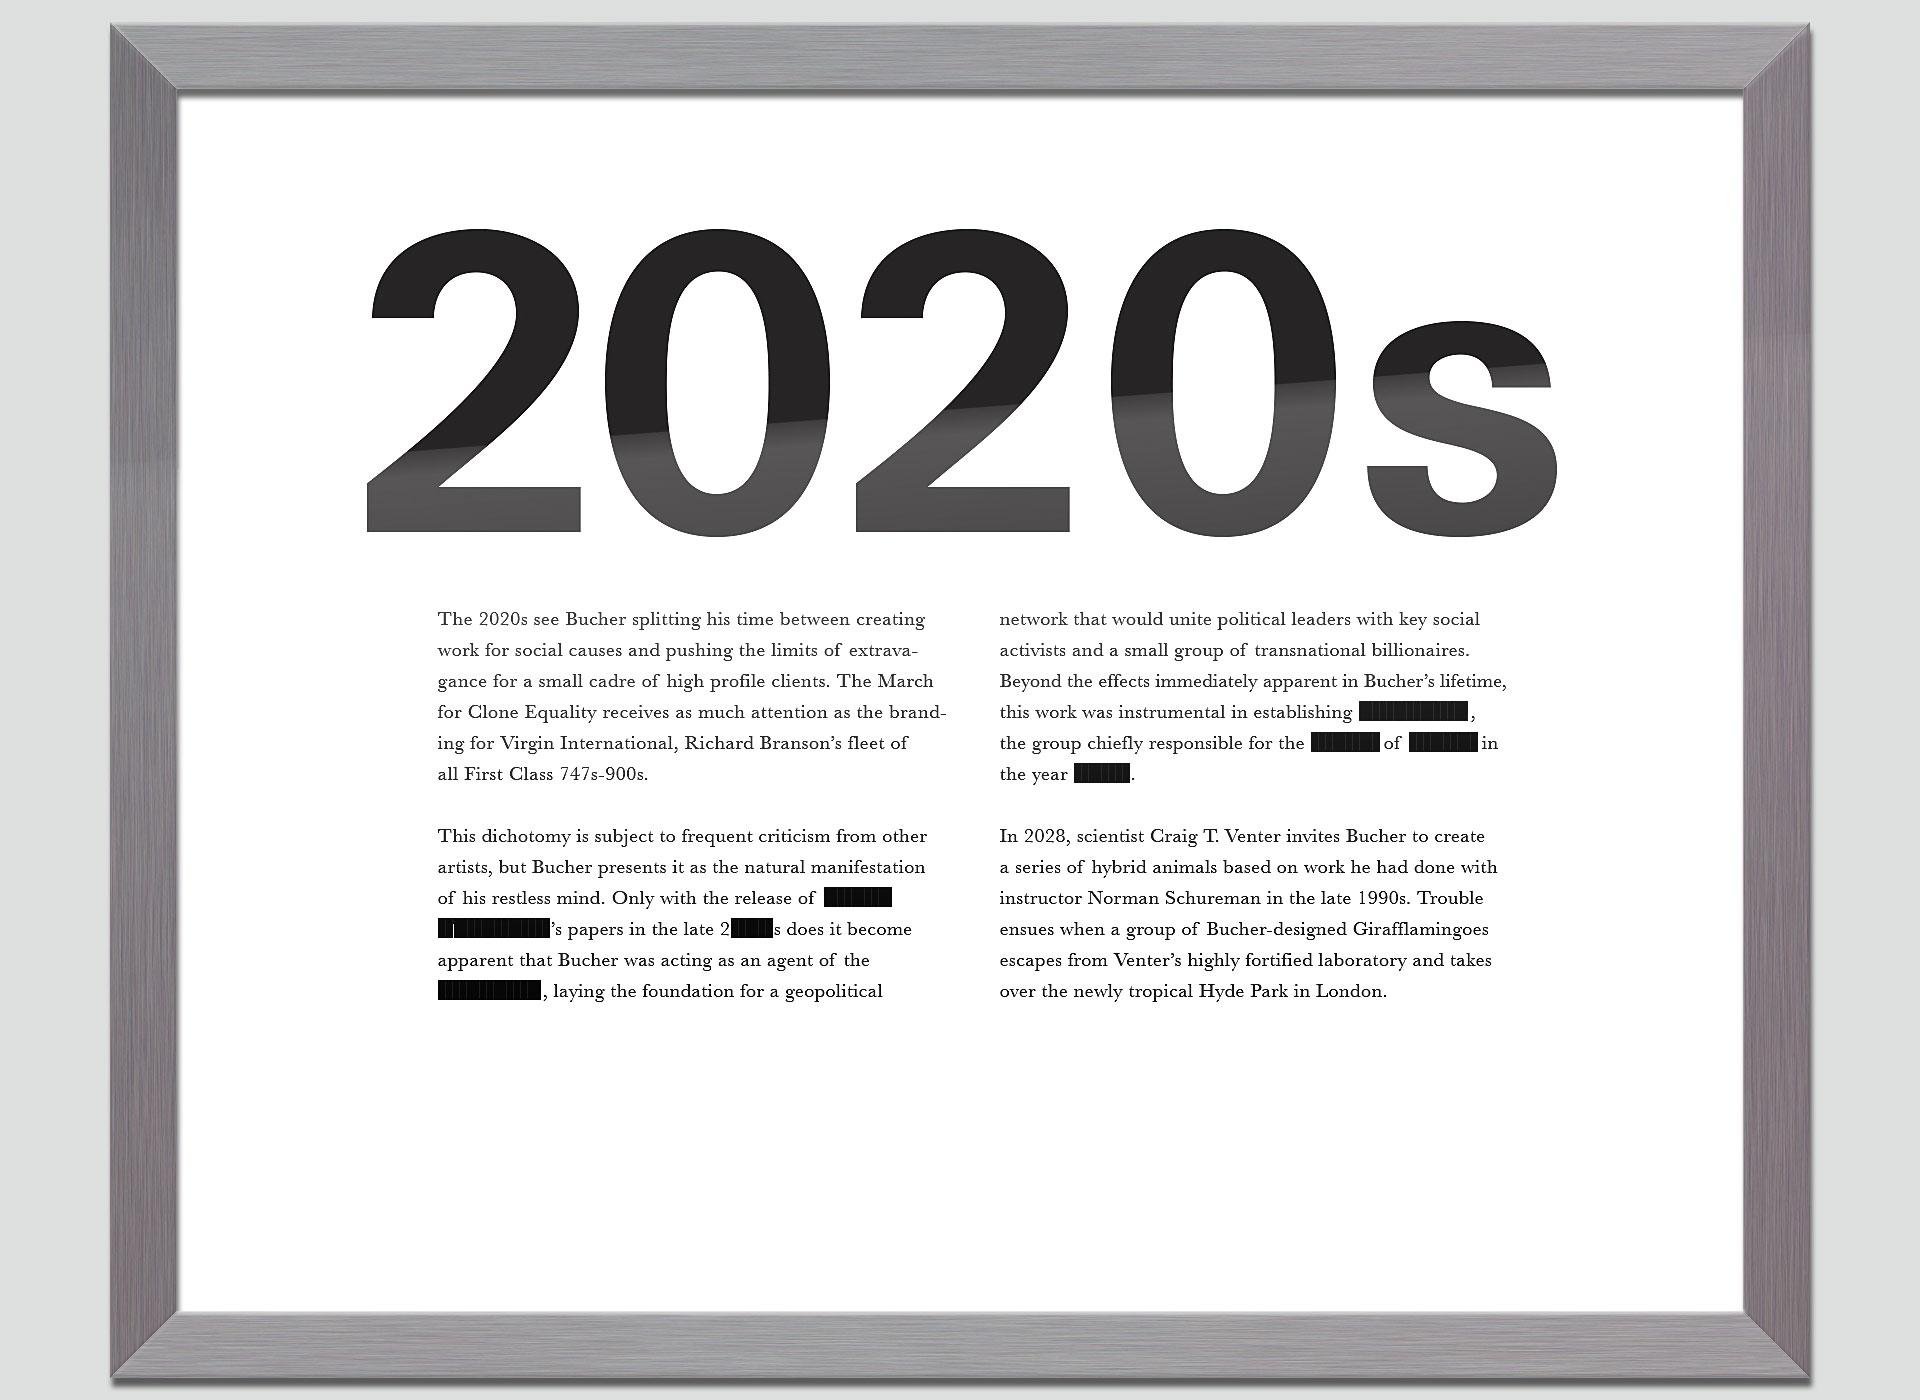 everything-decades-2020@2x.jpg